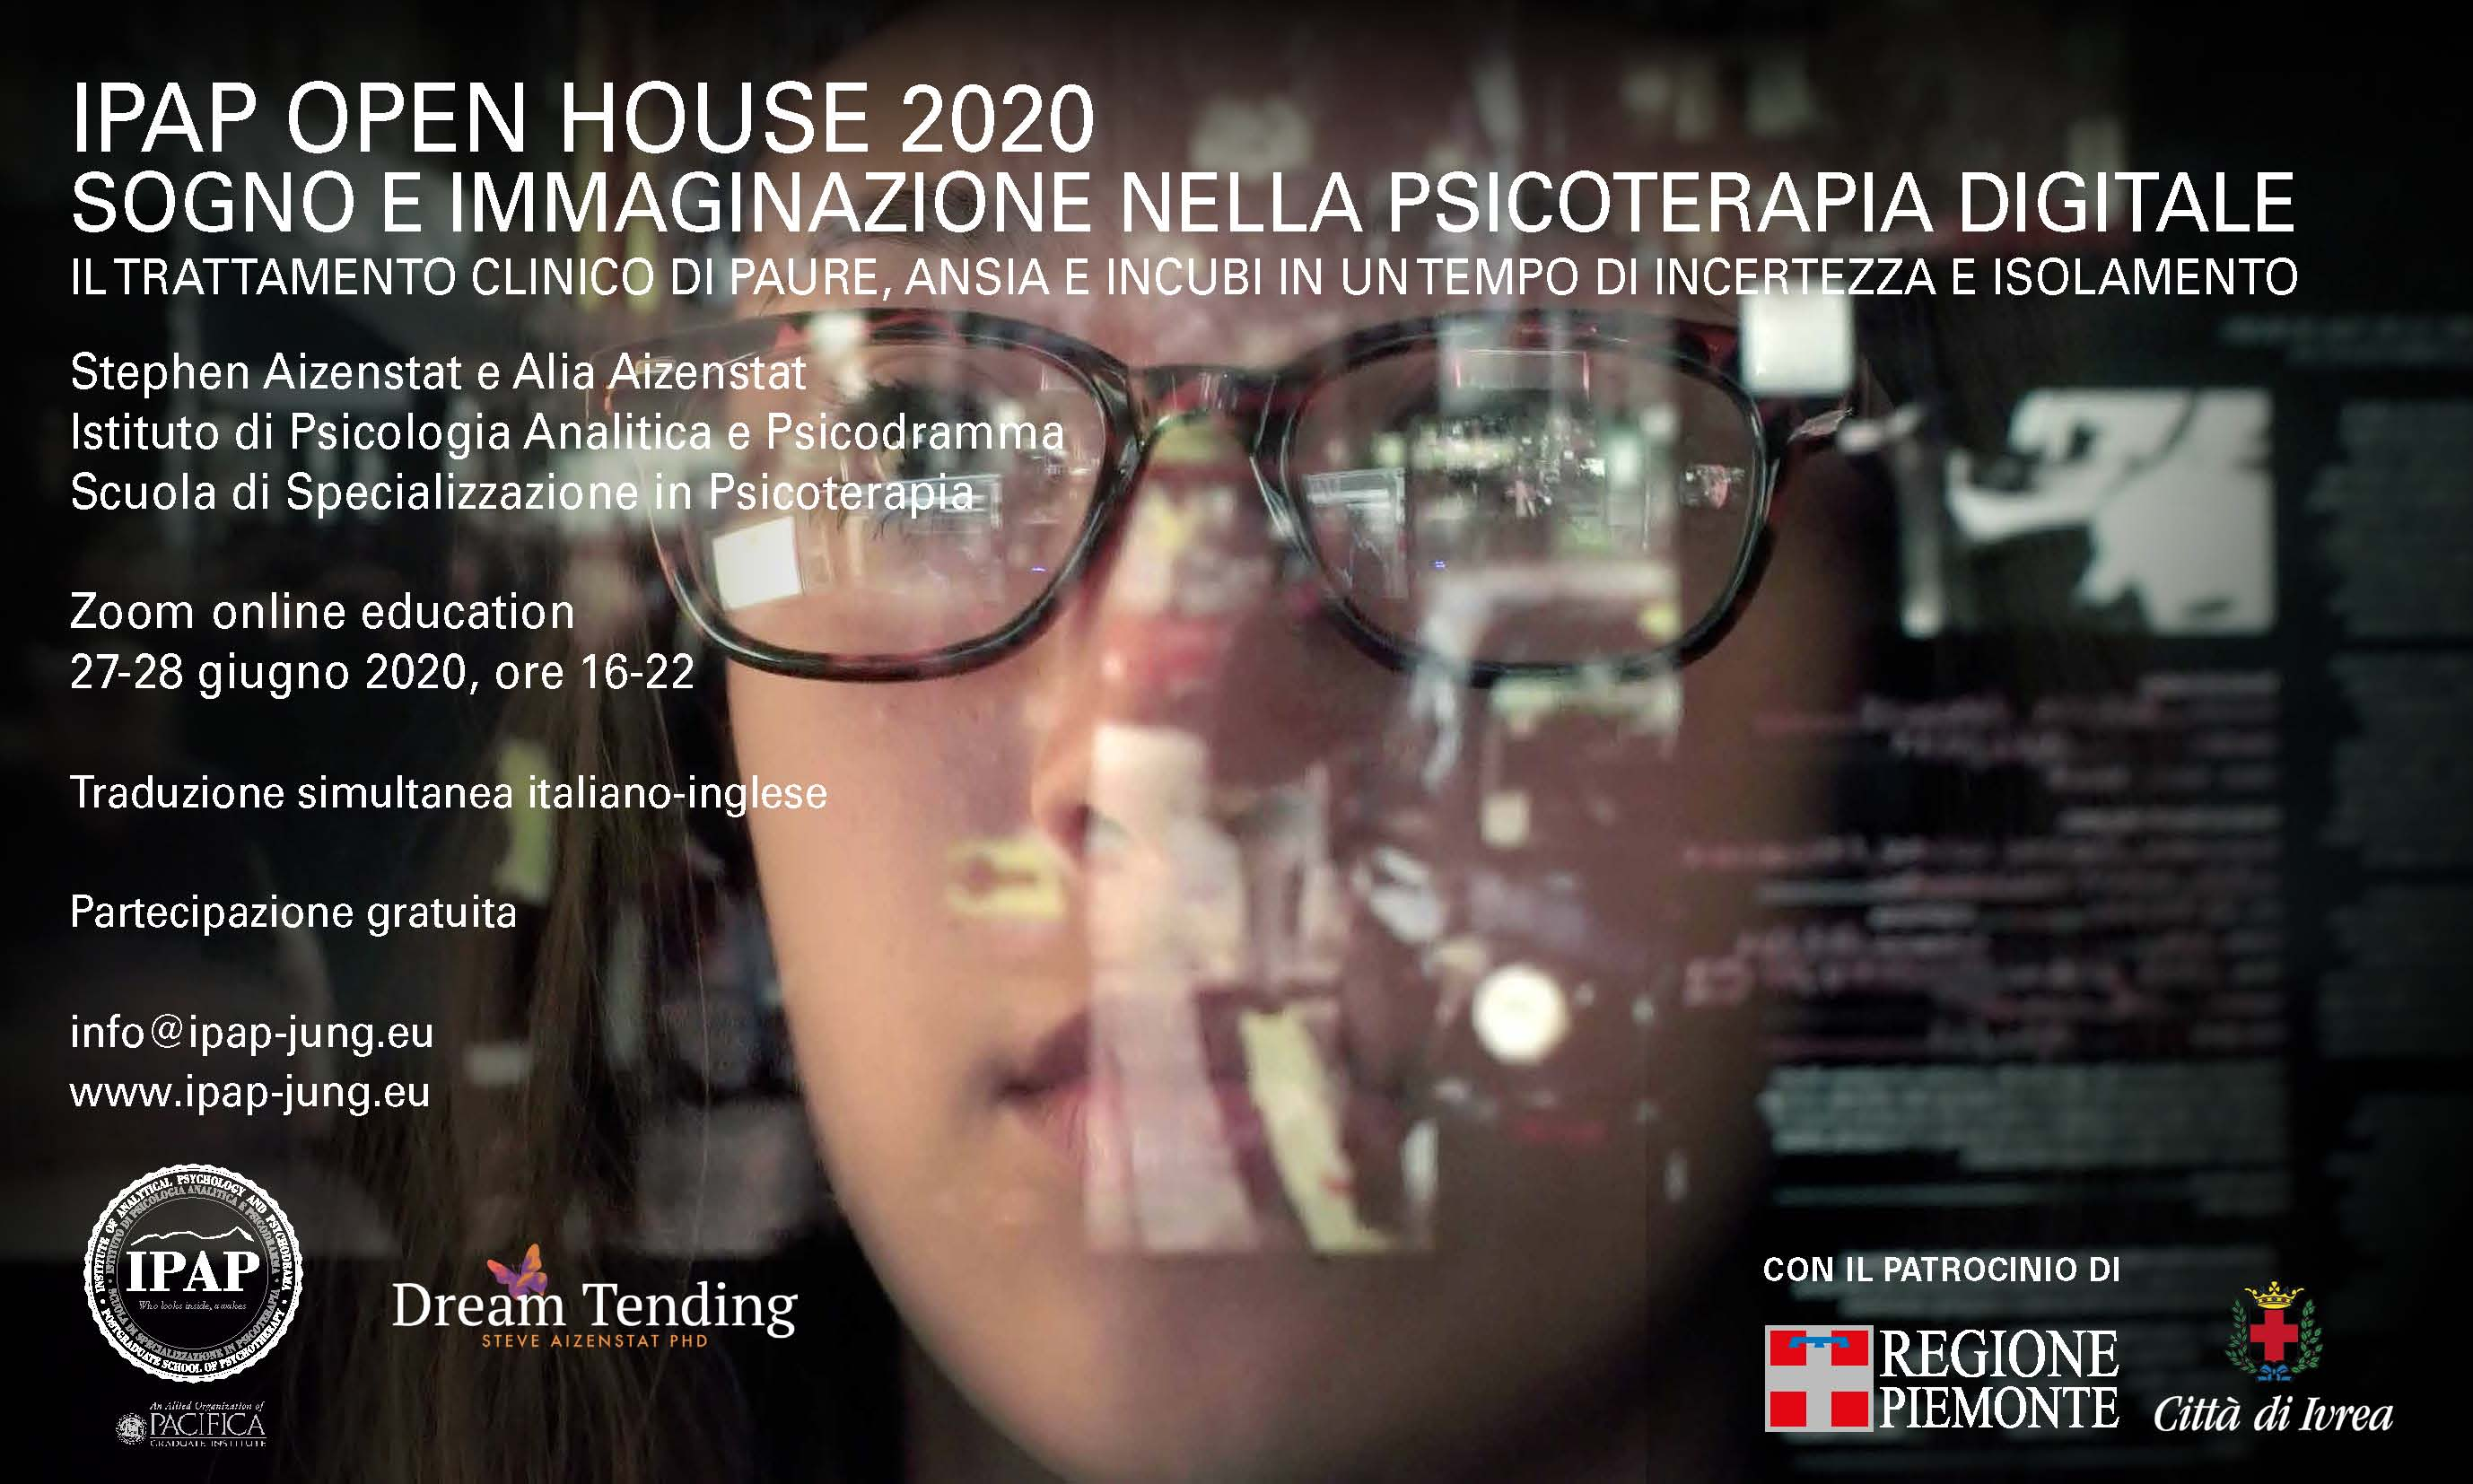 IPAP-Open-House-2020-foto-000